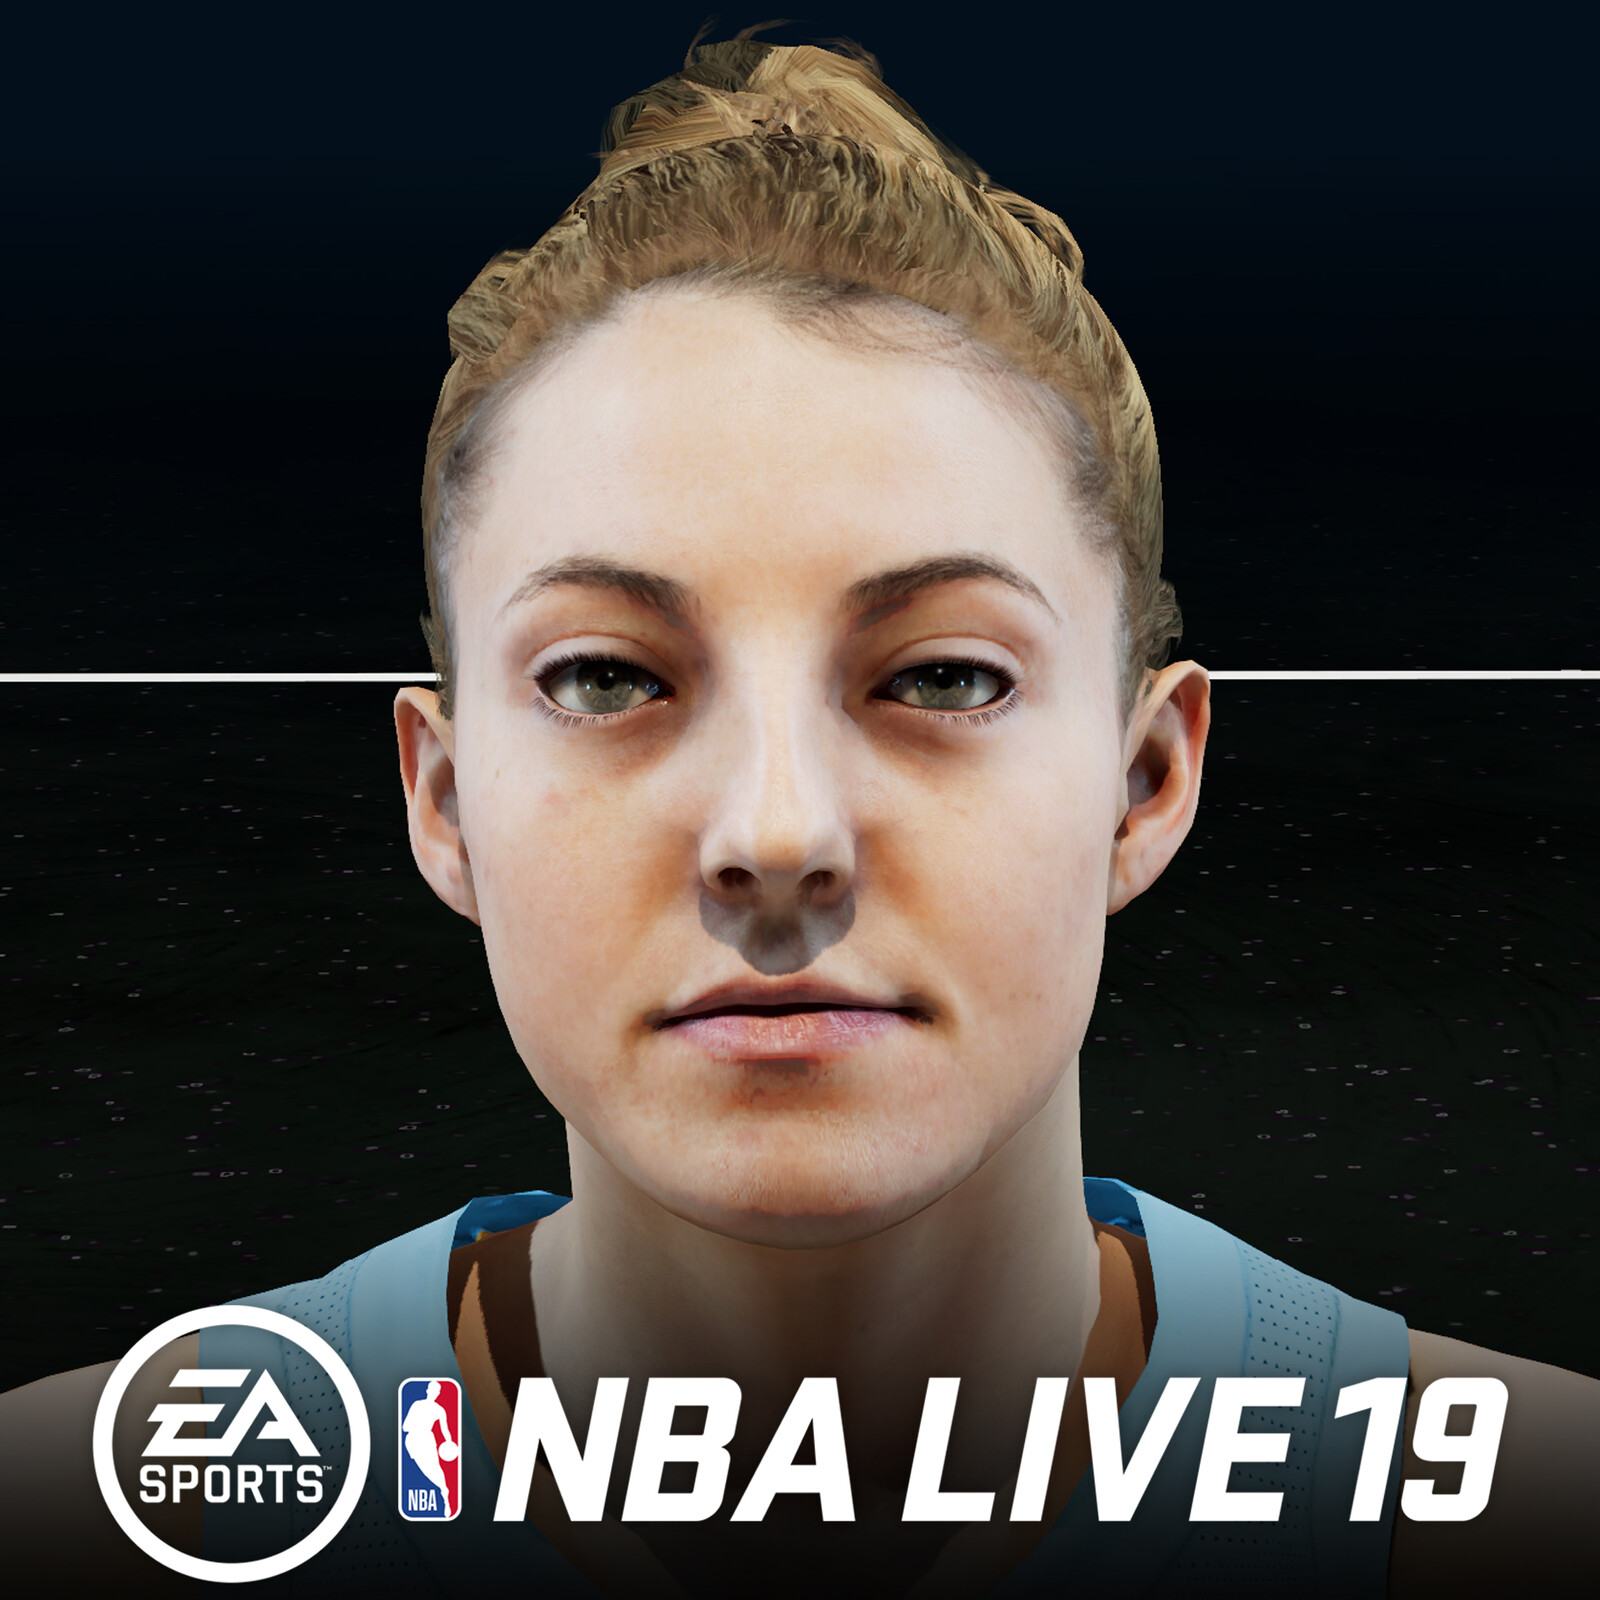 NBA LIVE 19 - Katie Lou Samuelson